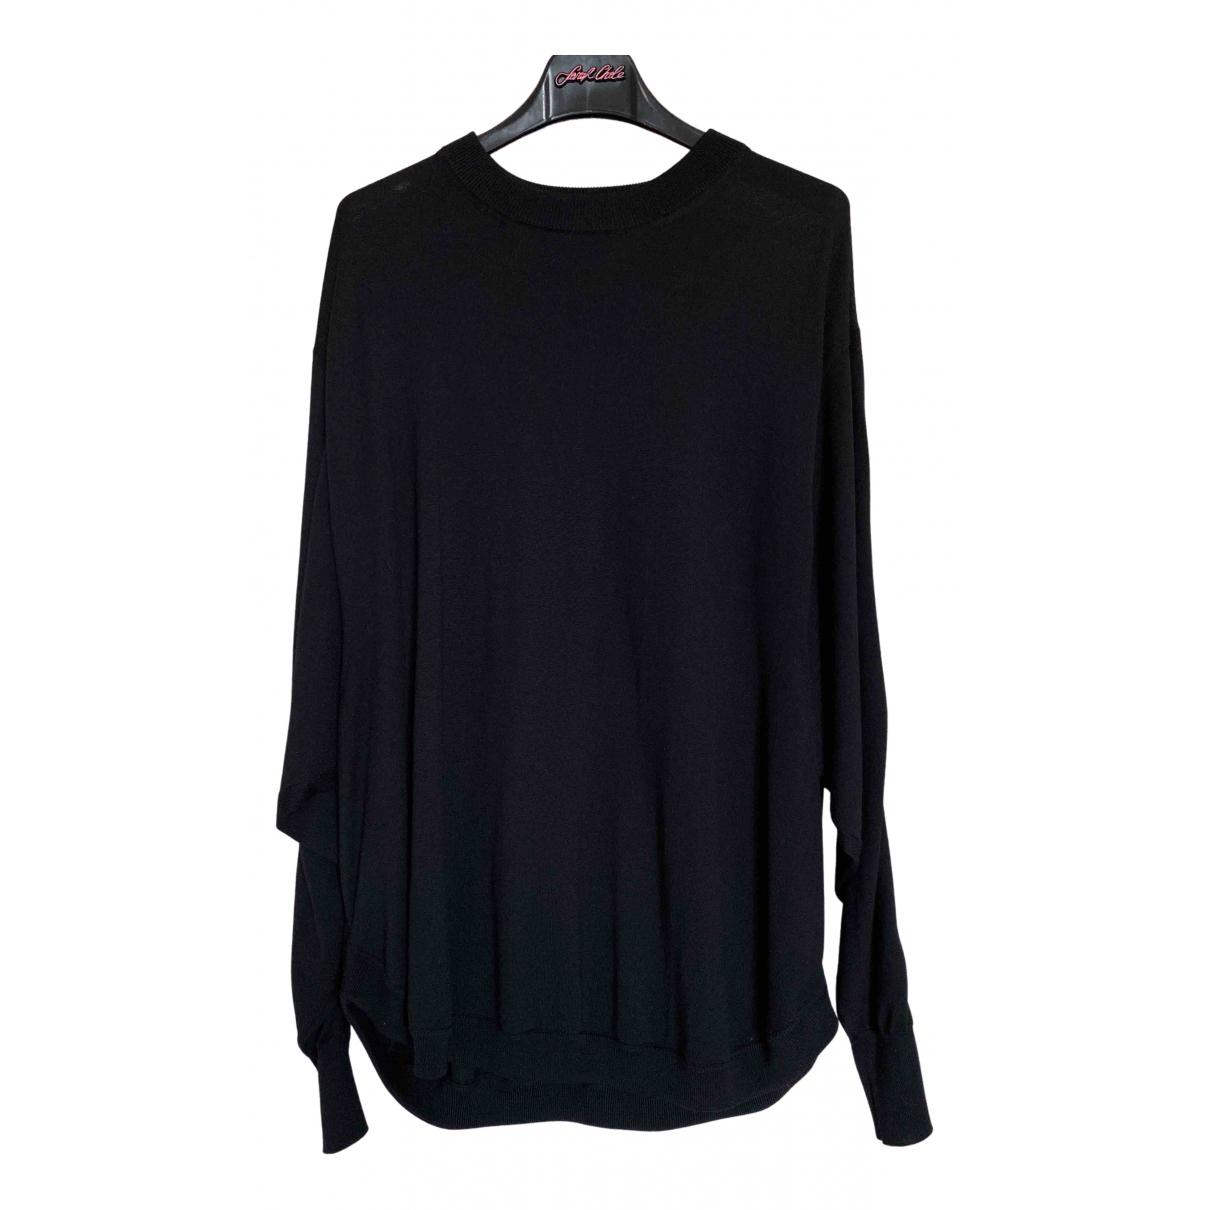 Givenchy \N Black Wool Knitwear for Women S International